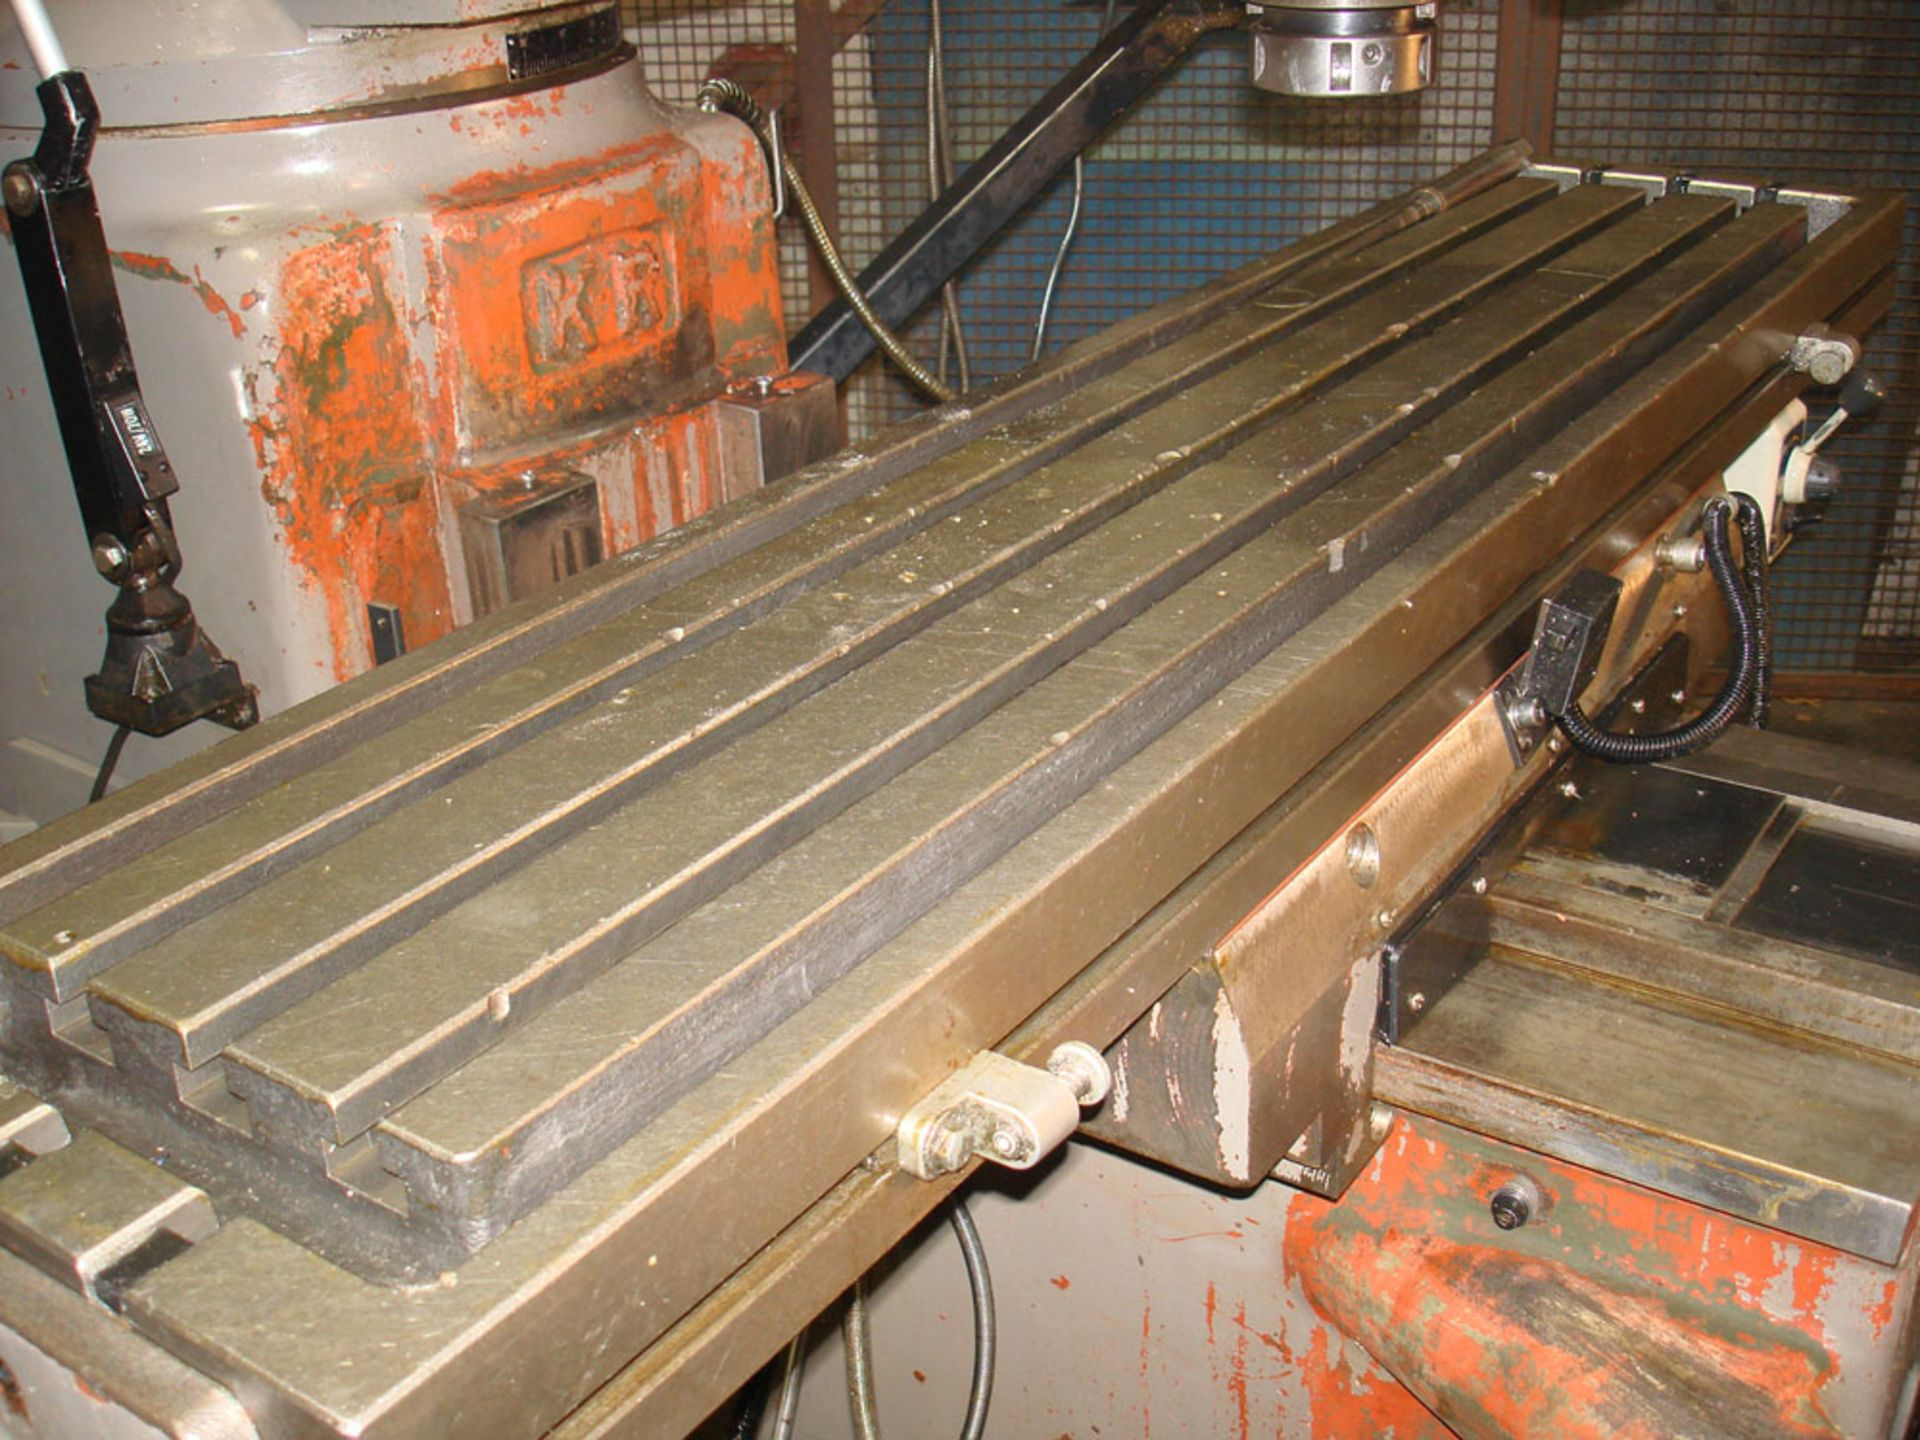 KRV 3000 SLV Turret Milling Machine. Table Size 1473 x 305mm. - Image 4 of 7